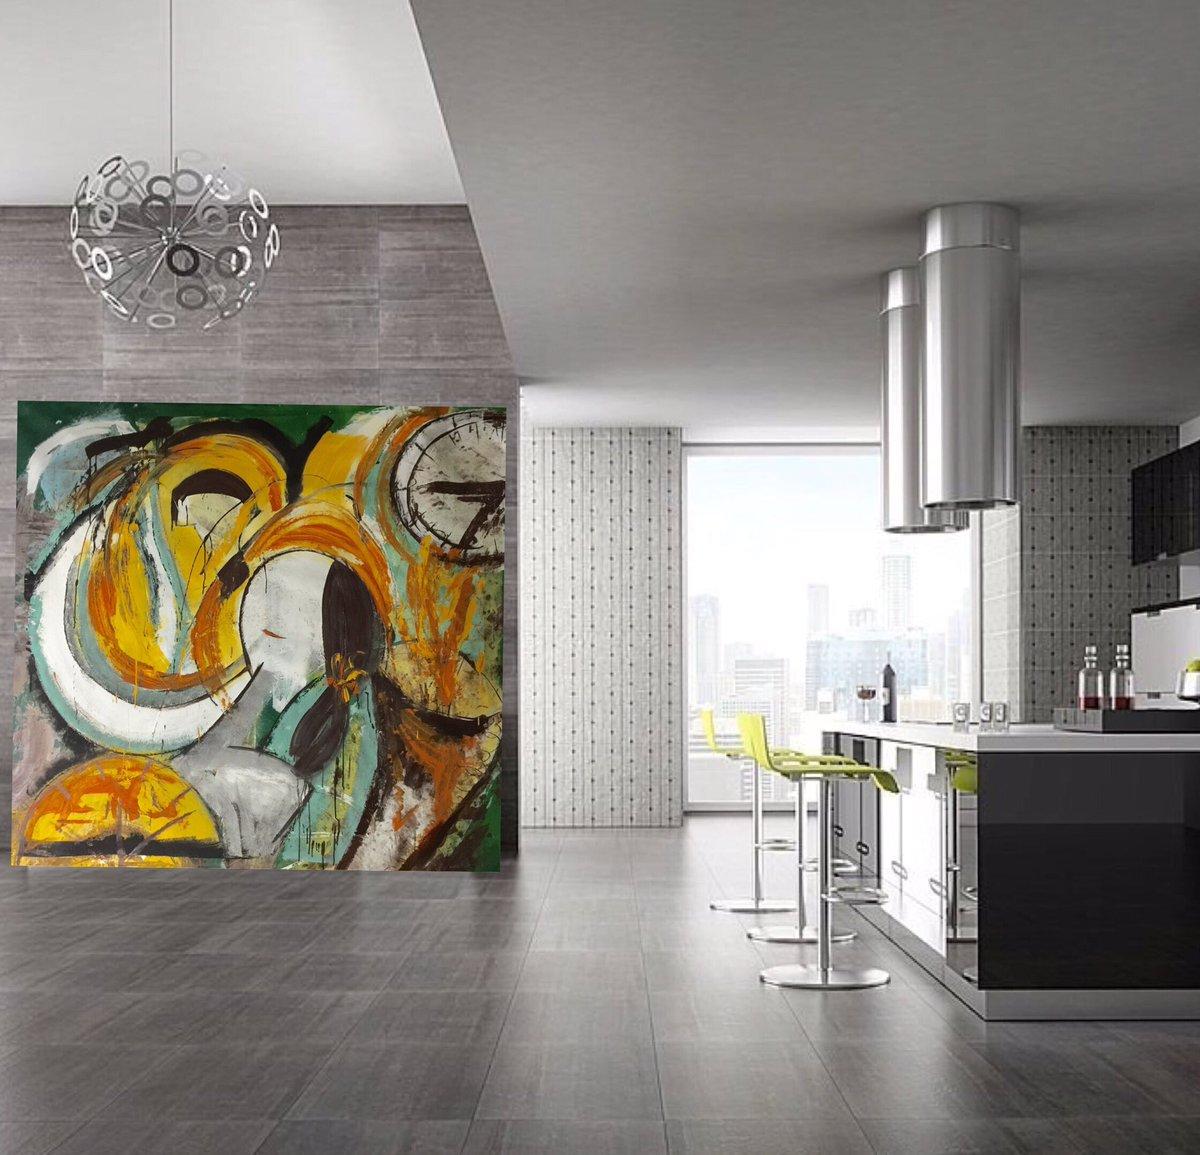 "Arredamento Casa Roma rudy koll on twitter: ""#roma*quadri#rudy koll+moderni/casa"